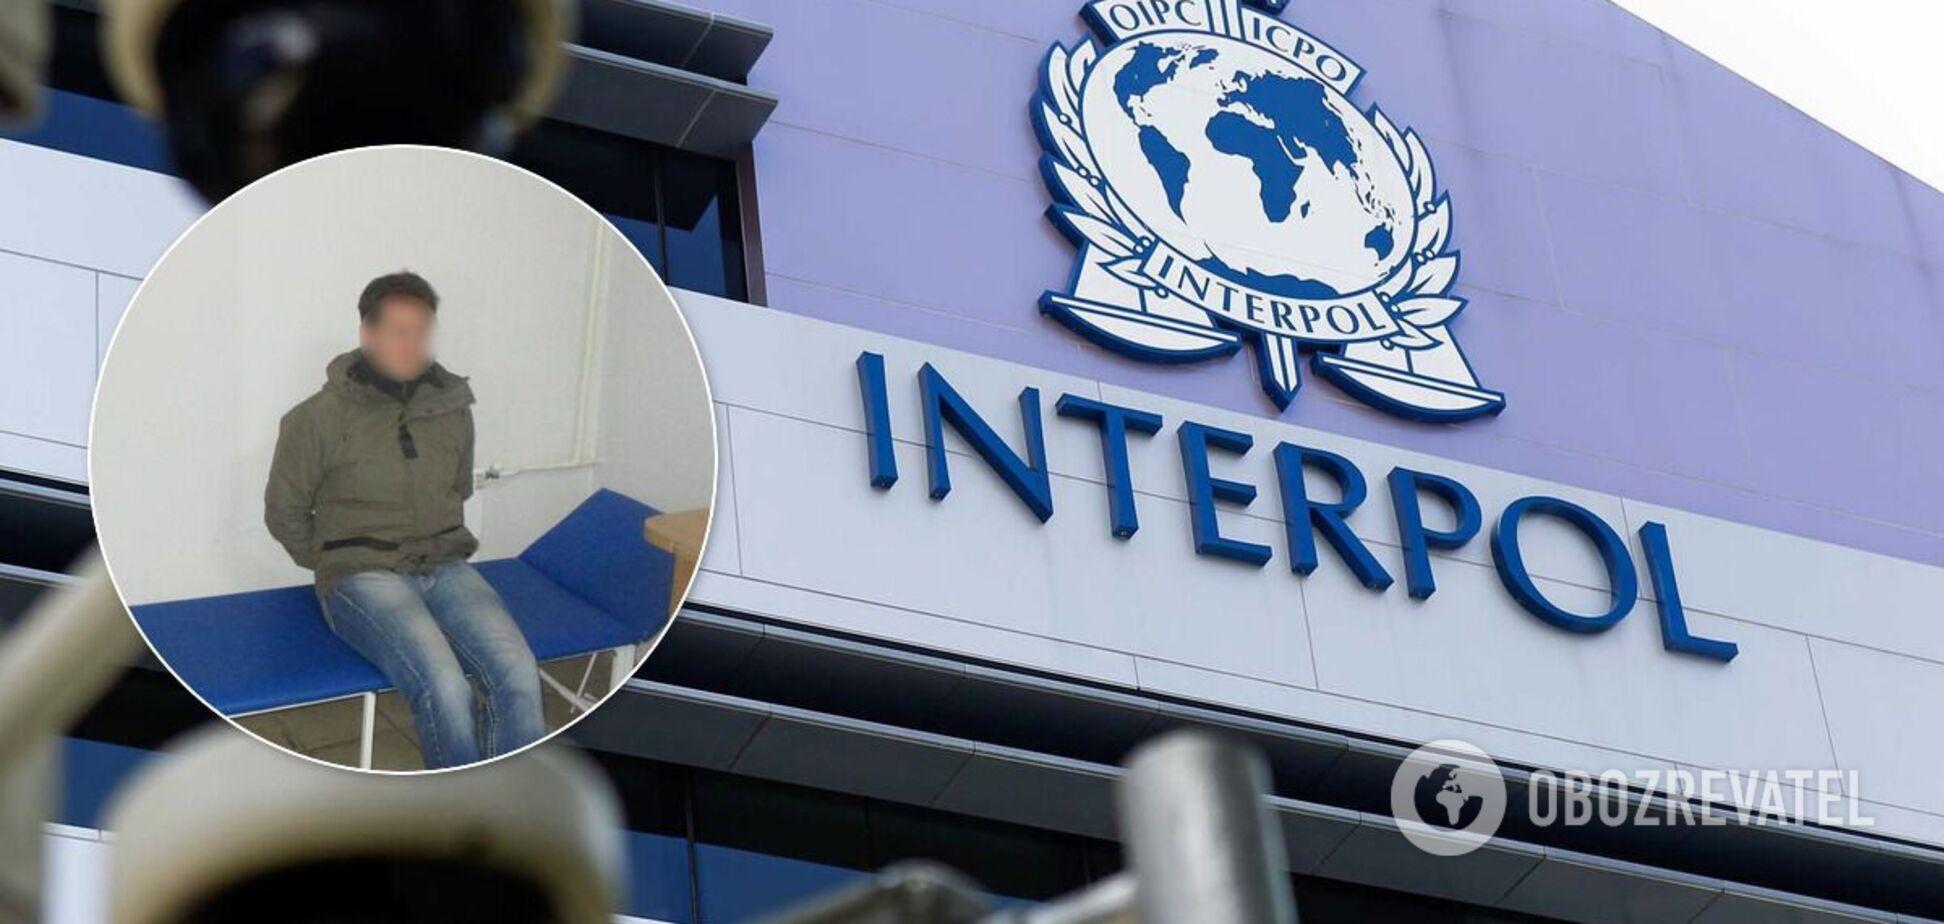 На границе с РФ задержали иностранца, которого разыскивал Интерпол. Фото